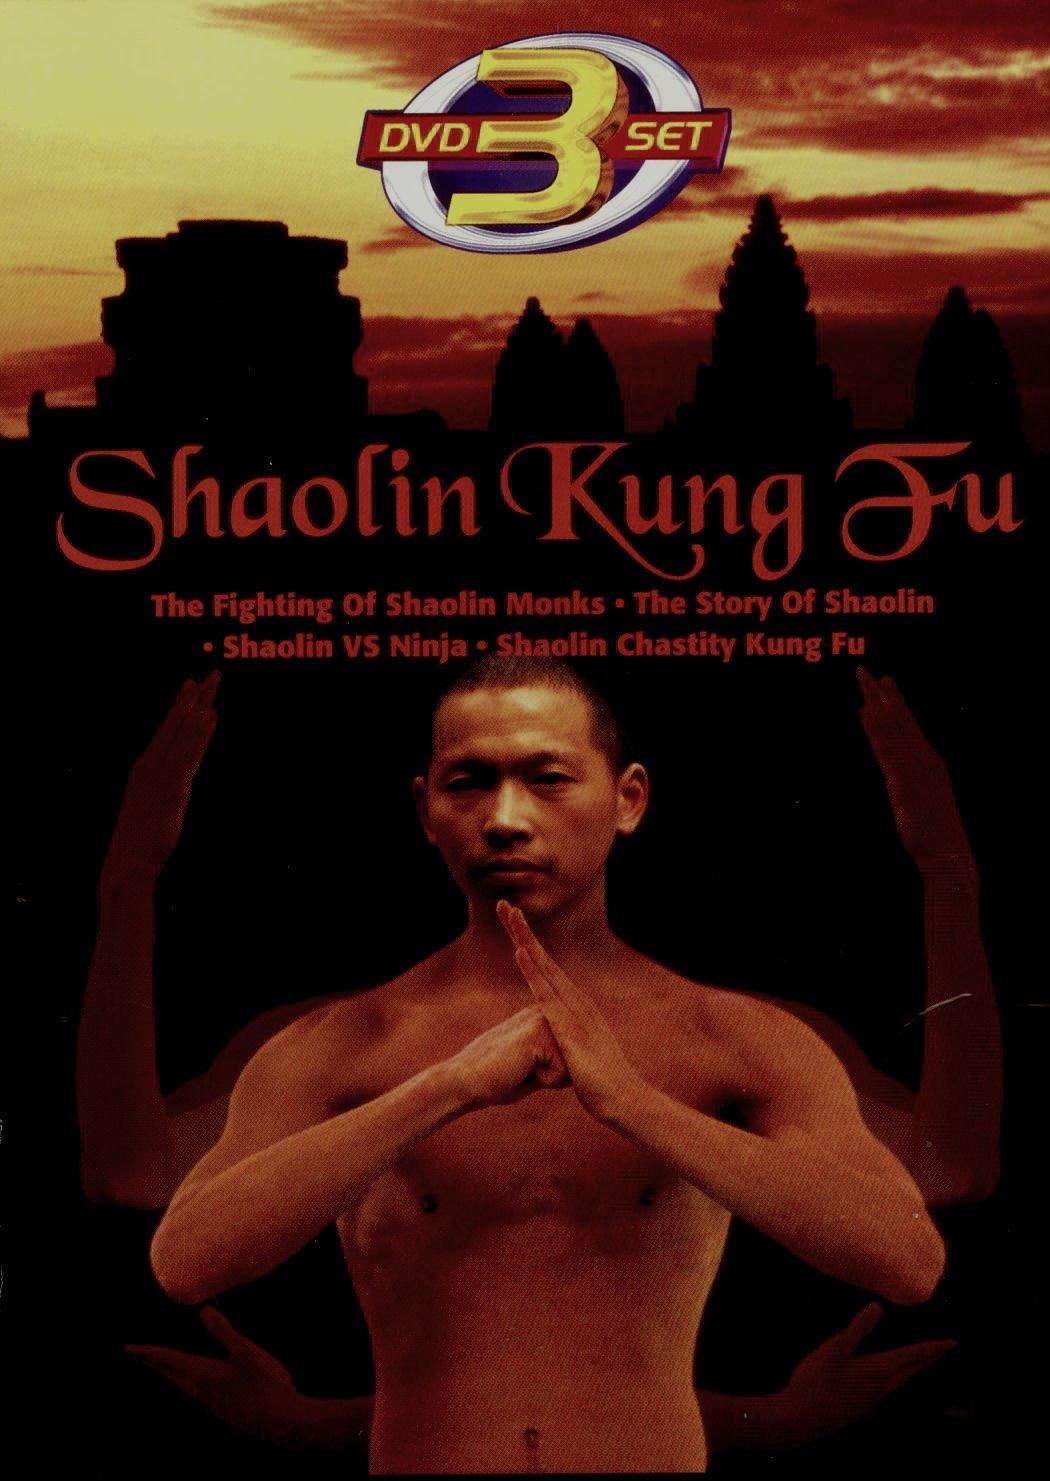 Amazon.com: Shaolin Kung Fu 3 DVD Set: The Fighting of ...